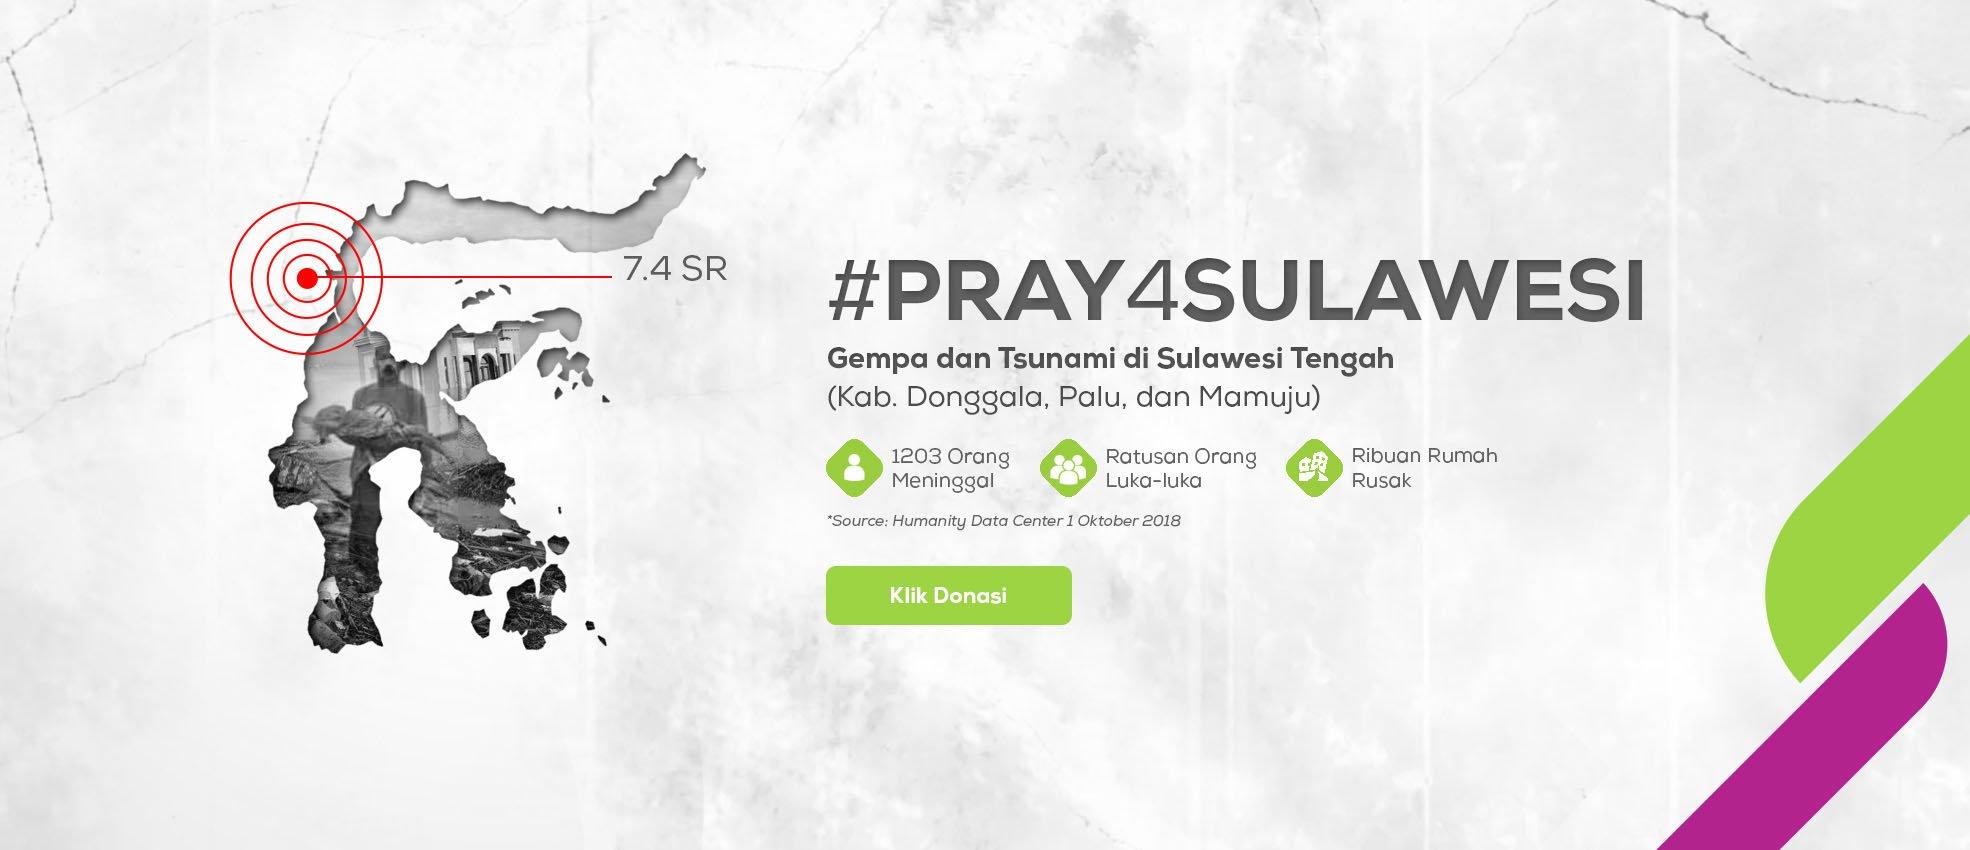 Gempa Bumi dan Tsunami Guncang Sulawesi Tengah, gempa bumi, palu, donggala, bencana alam